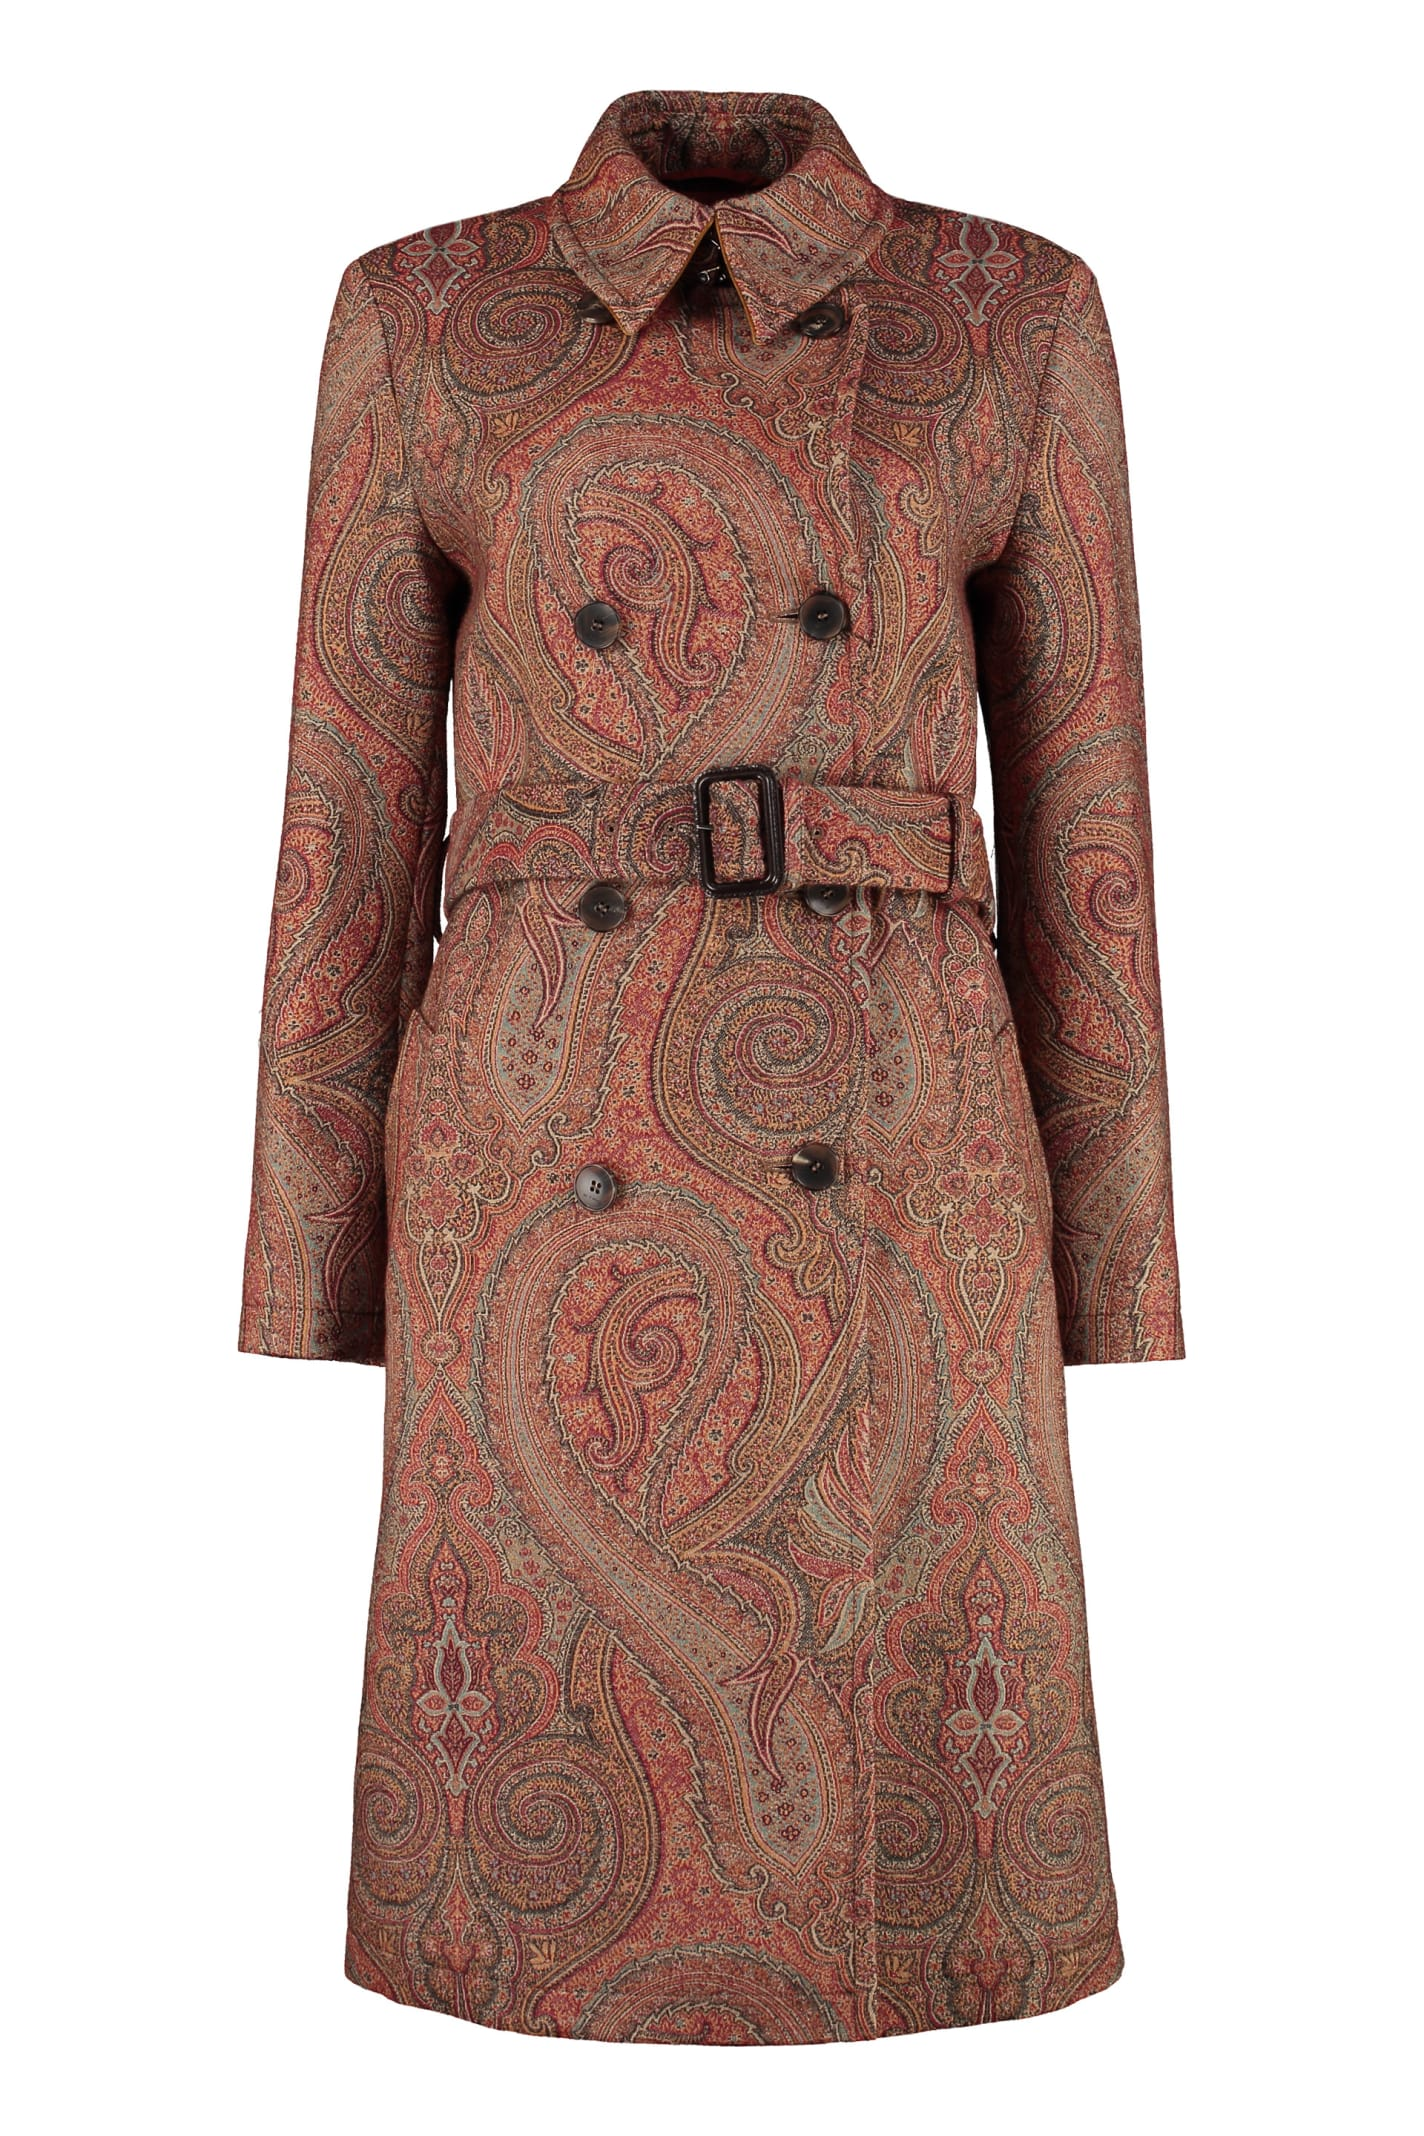 Etro Paisley Double-breasted Coat